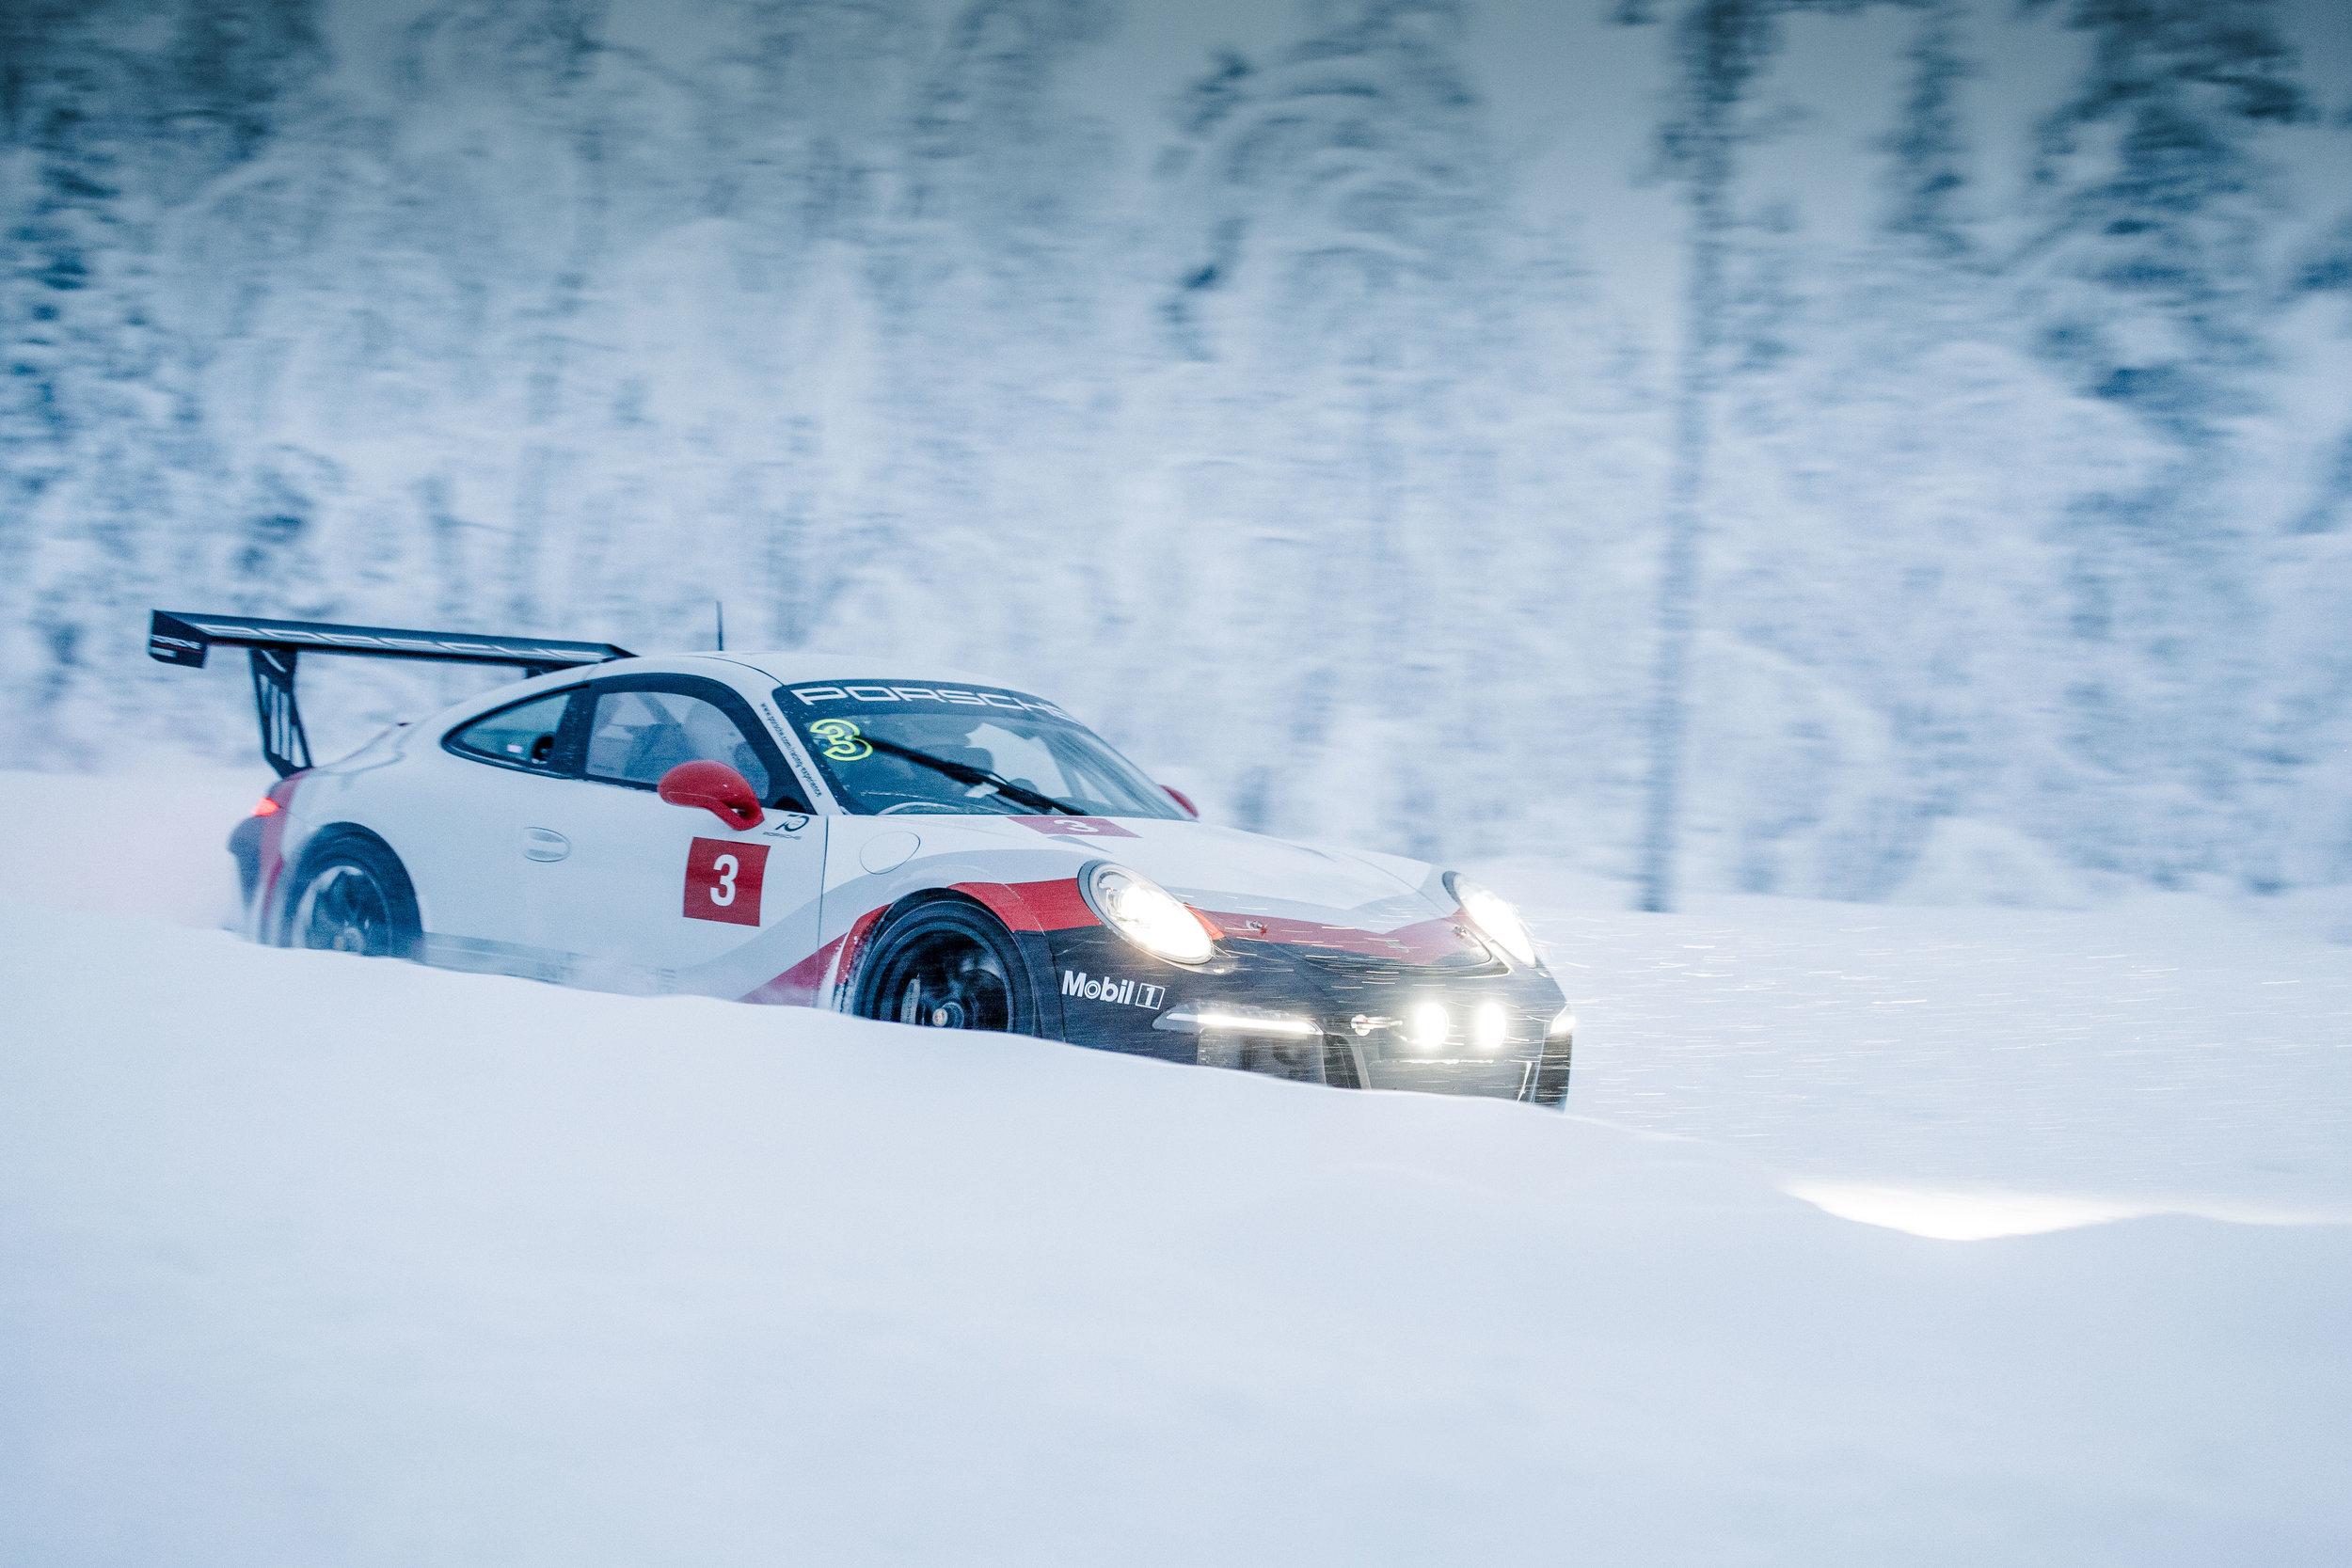 Porsche Ice Experience on Ice_30_01_2019_0181_175629.jpg